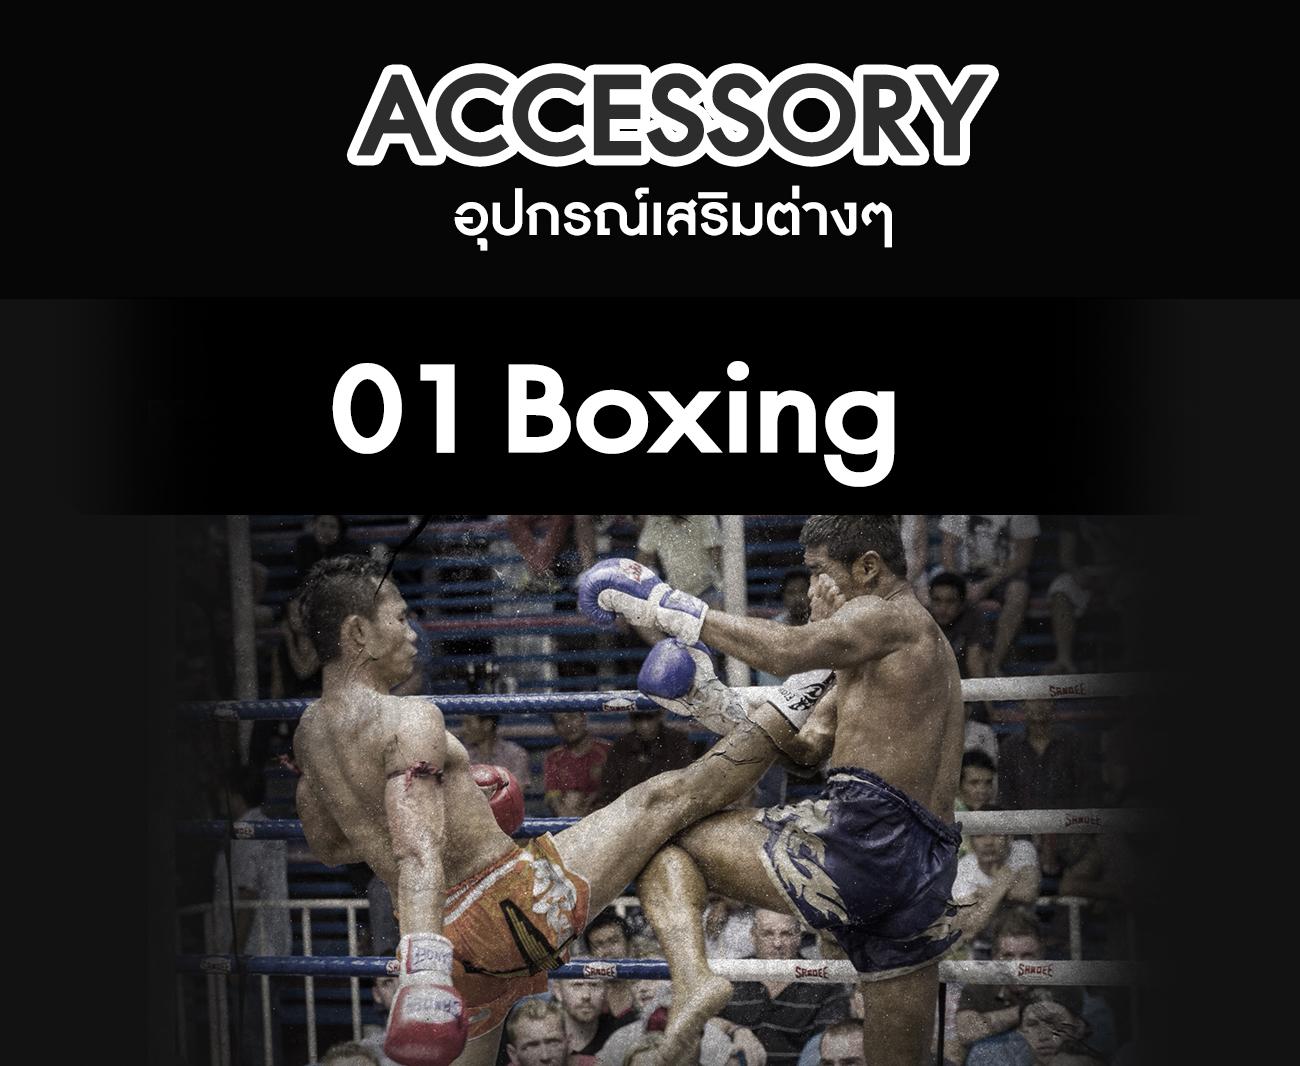 Functional Boxing Ring